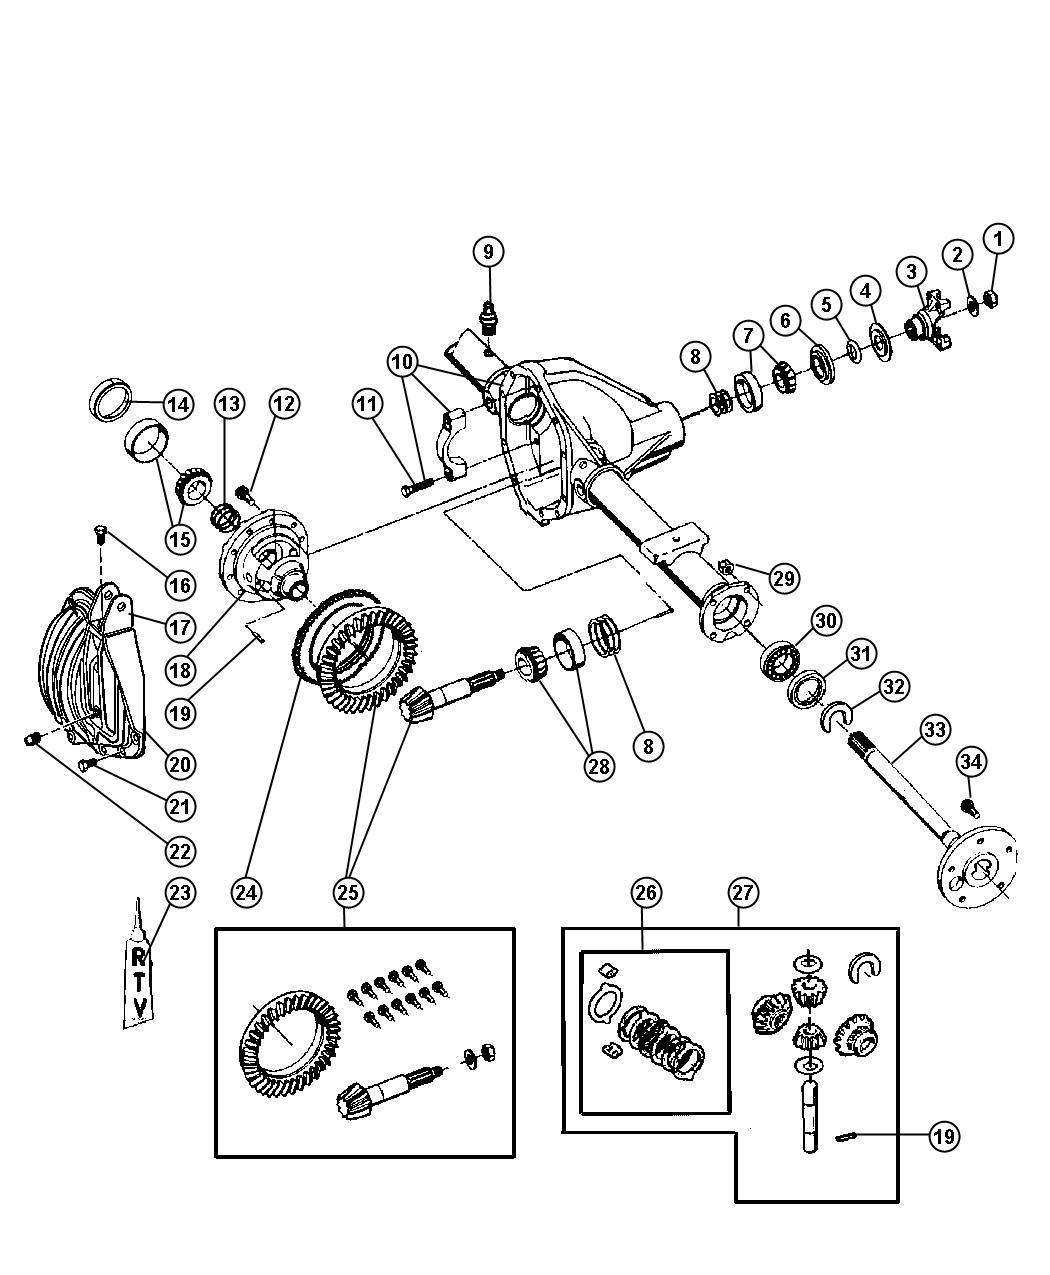 differential diagram for 2004 dodge ram 1500